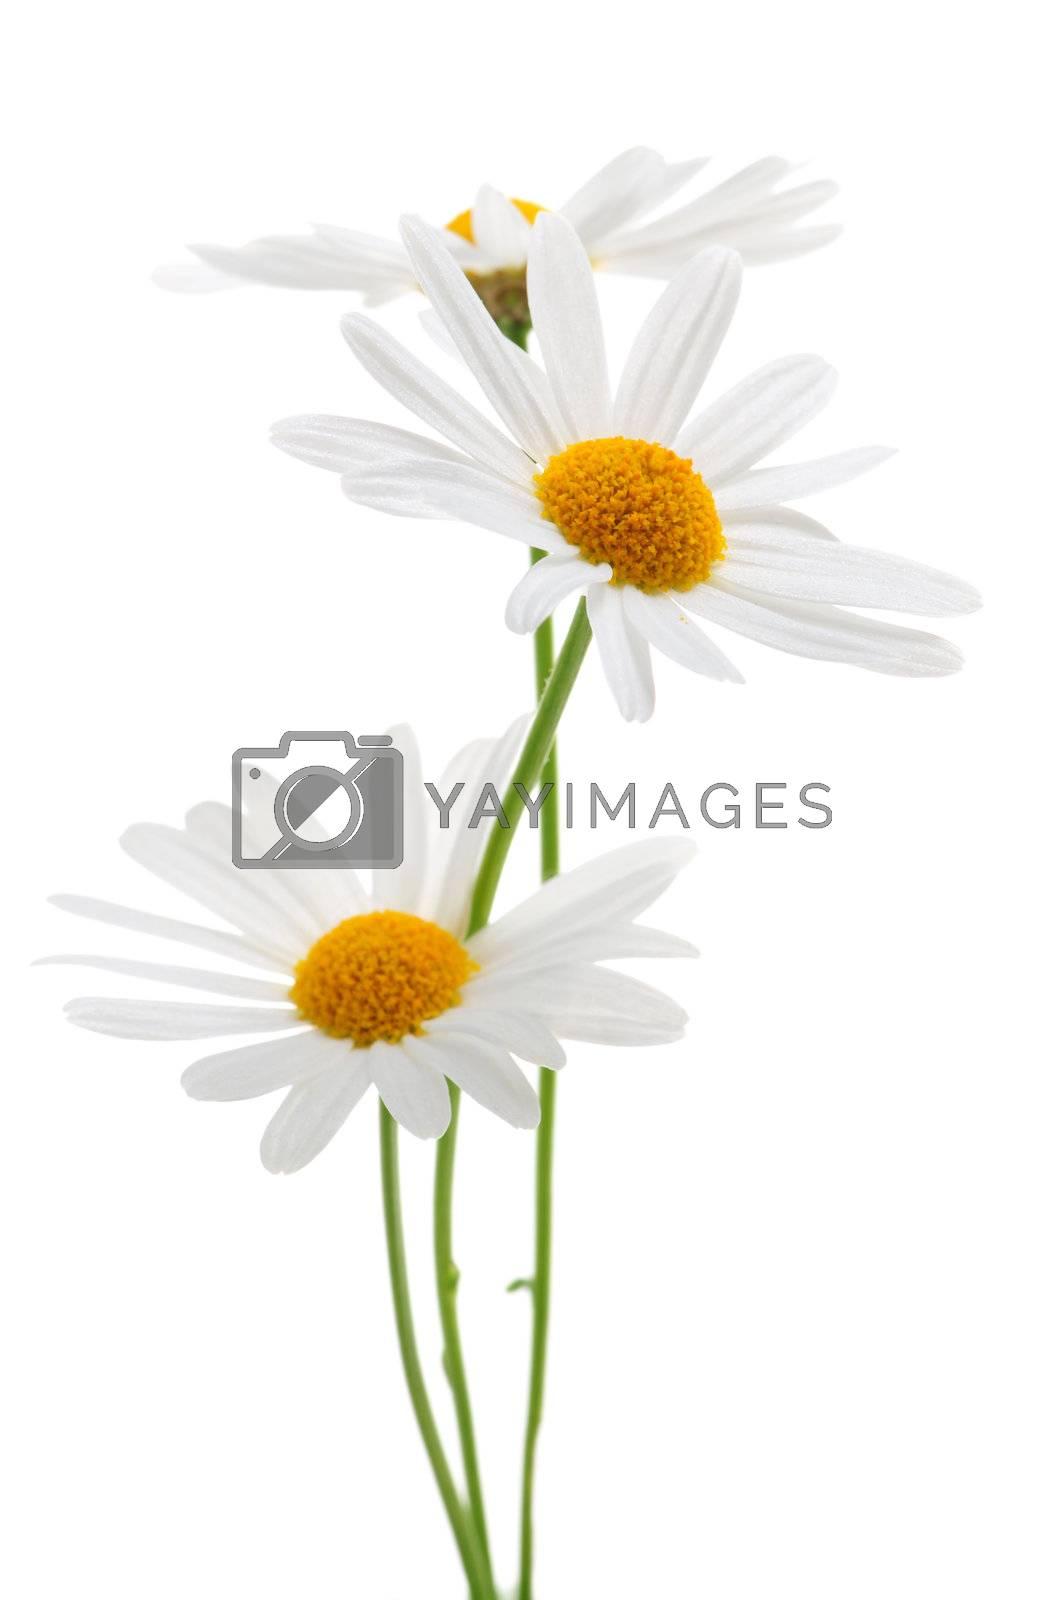 Daisy flowers isolated on white background